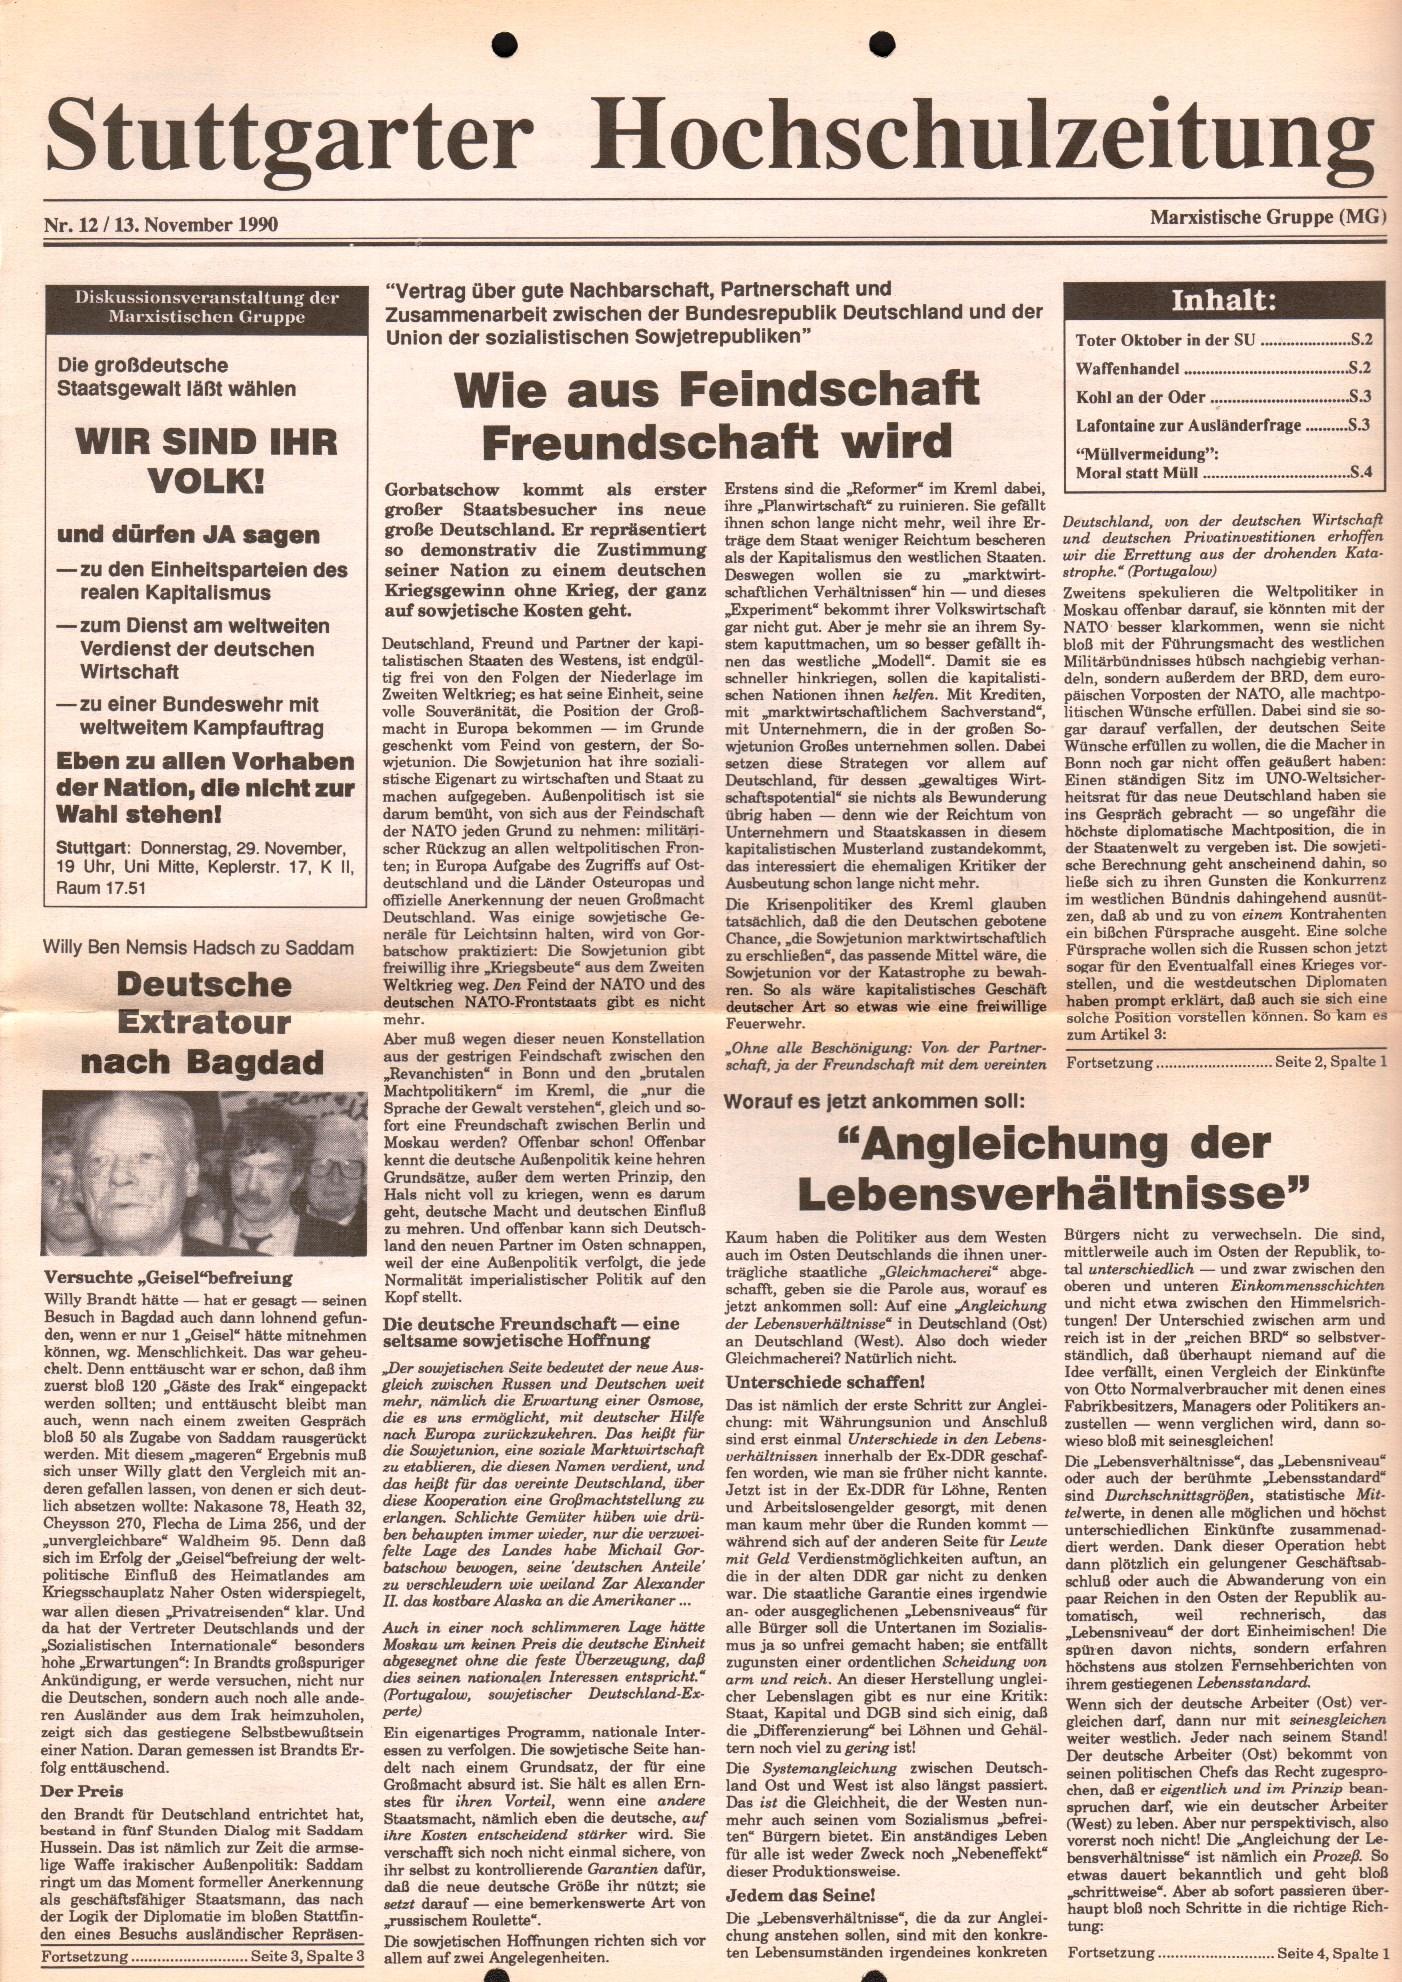 Stuttgart_MG_Hochschulzeitung_1990_12_01